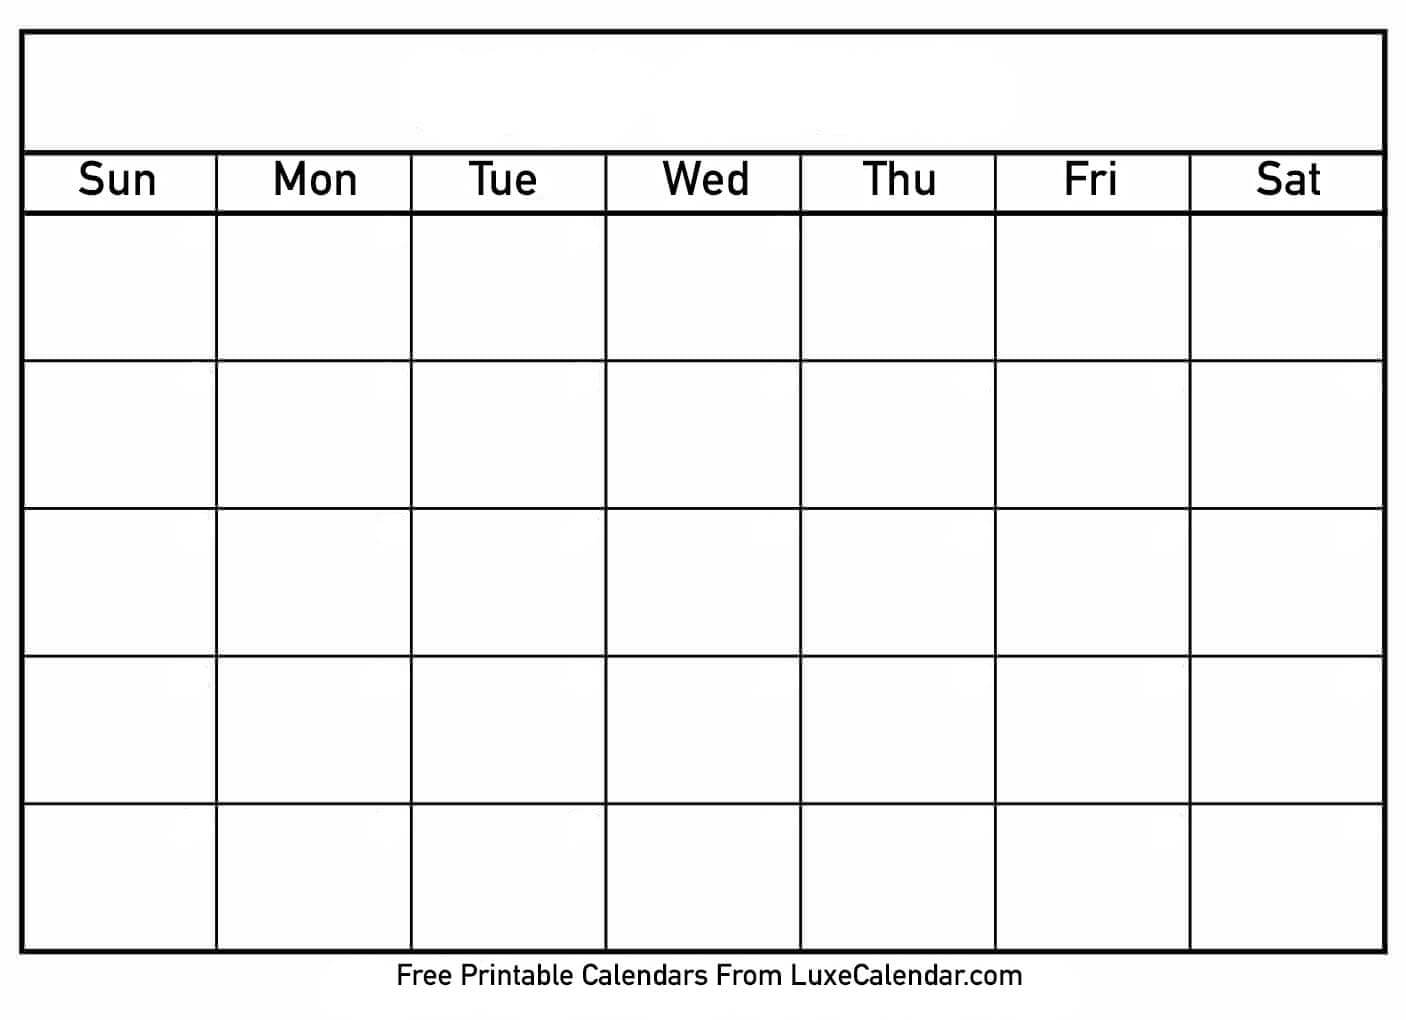 Printable Calendar Templates Full Page - Calendar For Full Page Blank Calendar Template